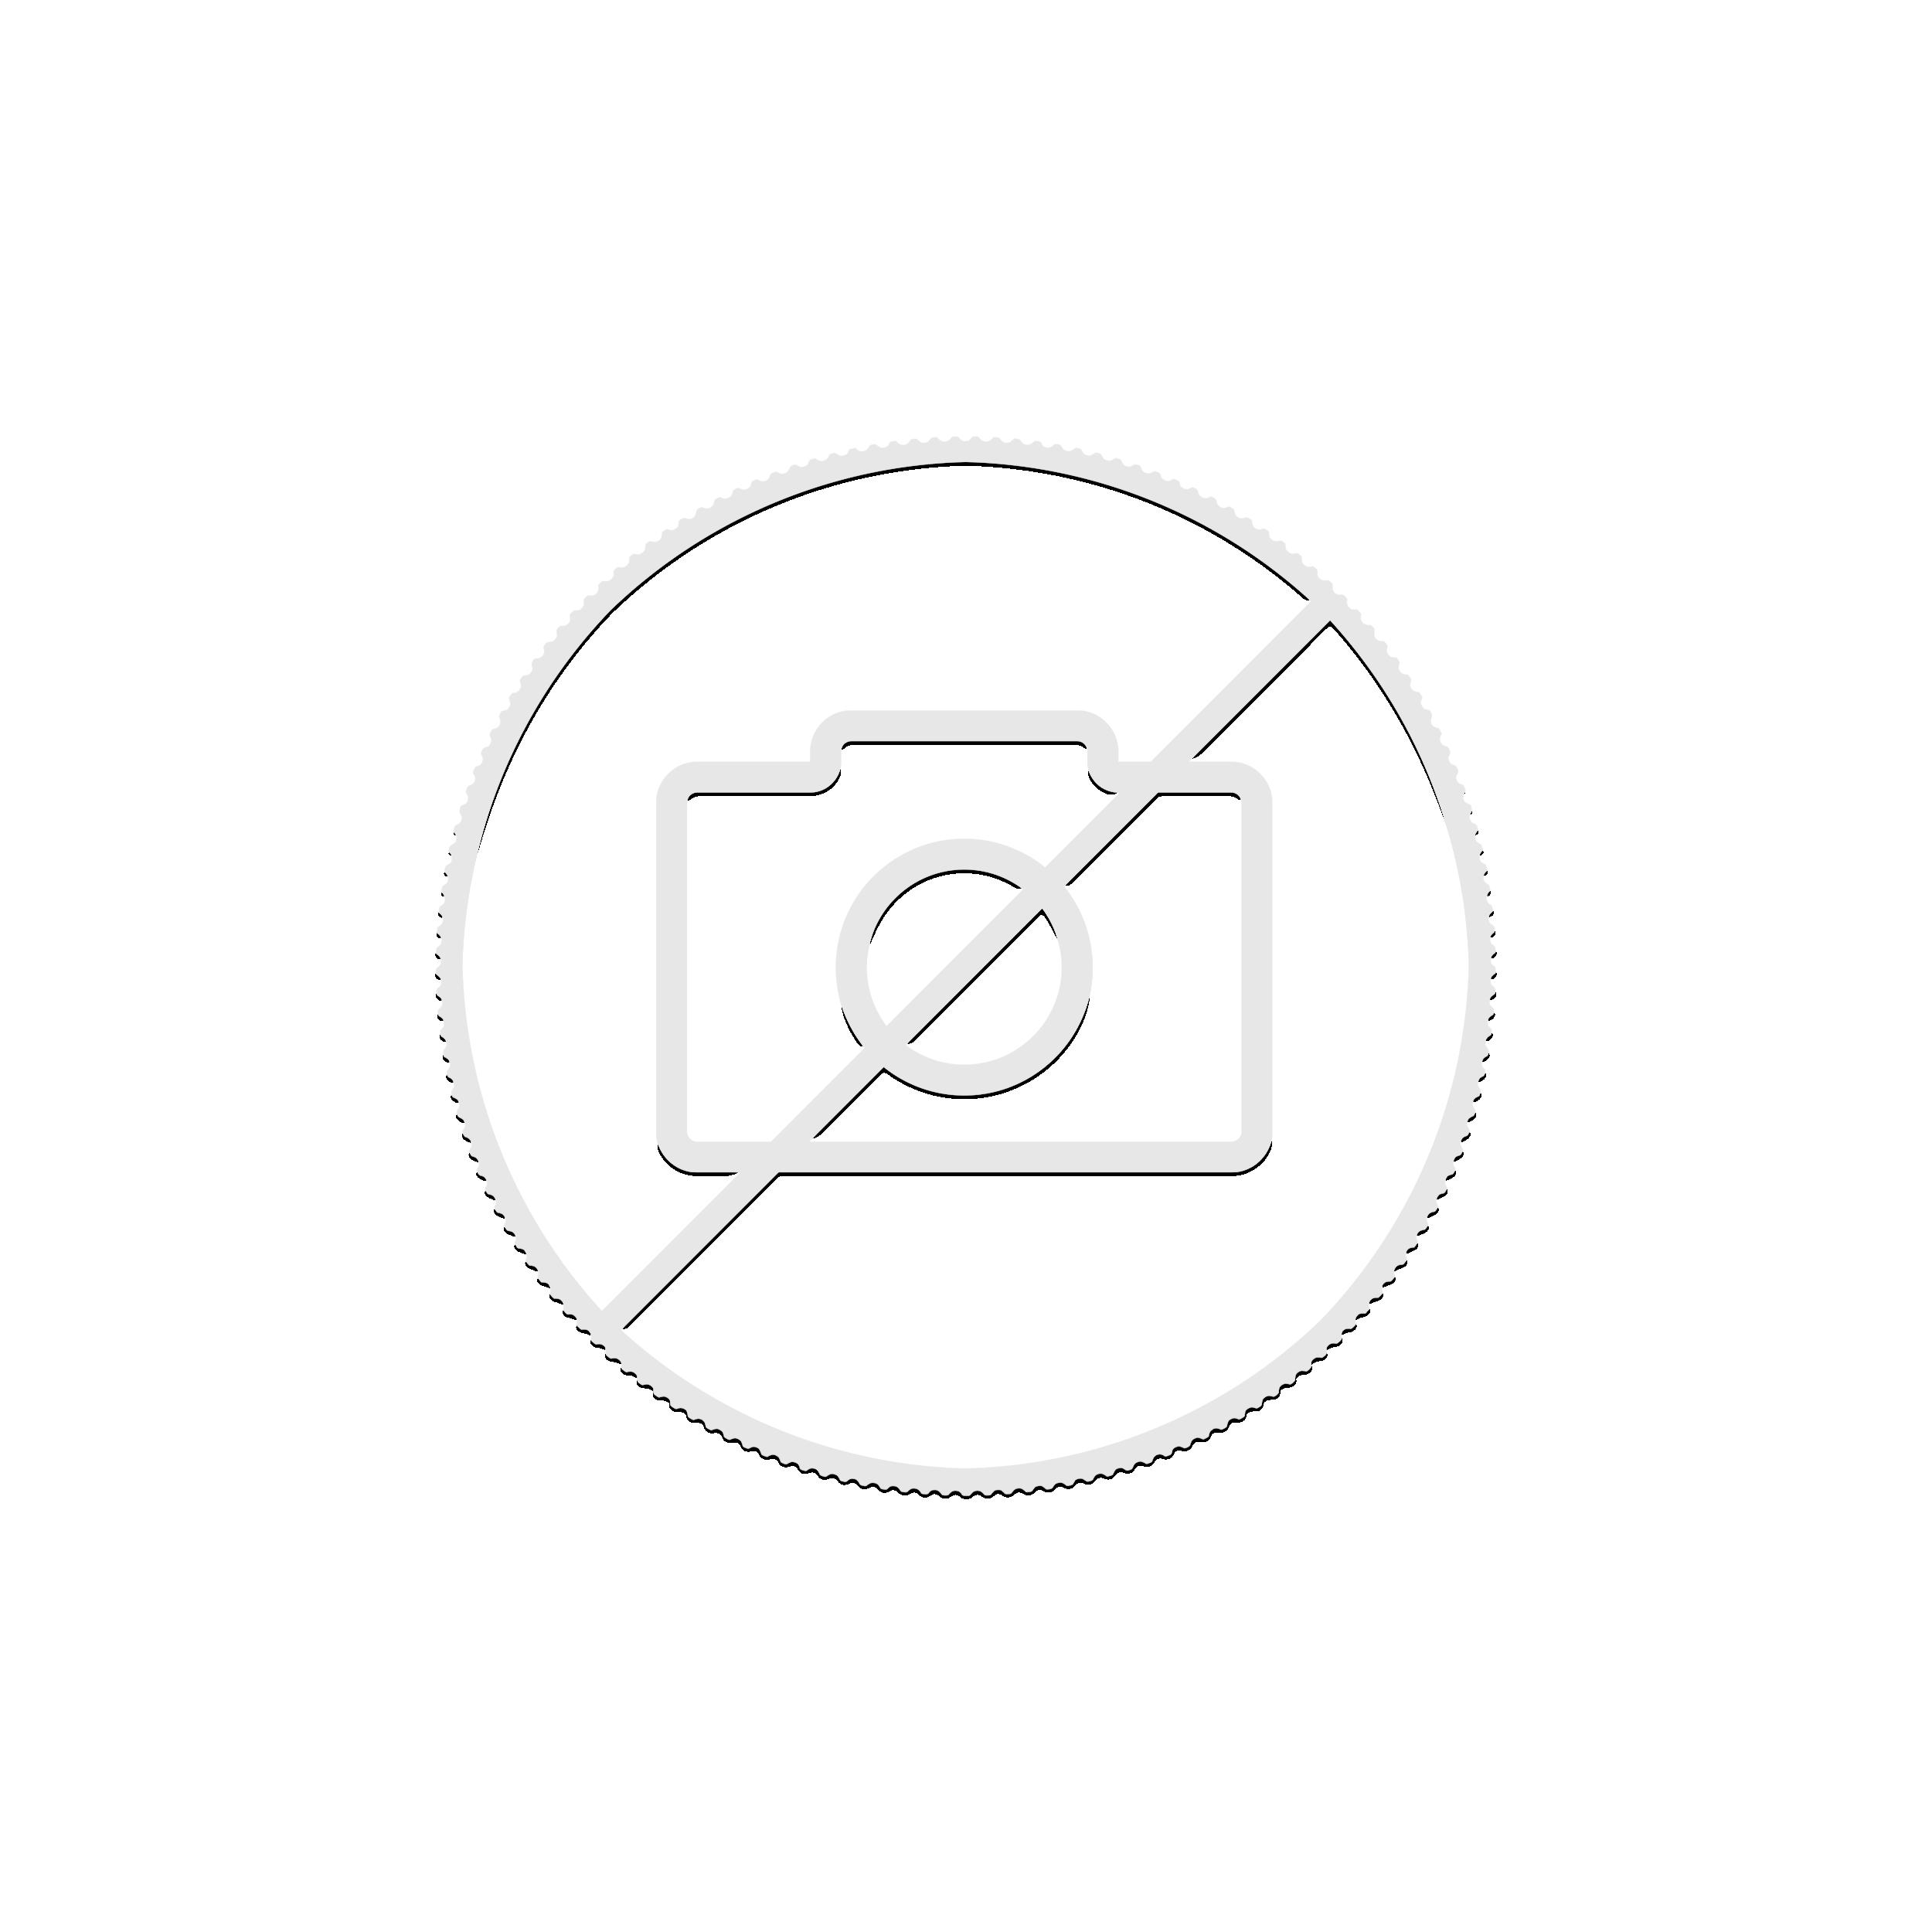 1 troy ounce gouden Maple Leaf 2017 Voyageur